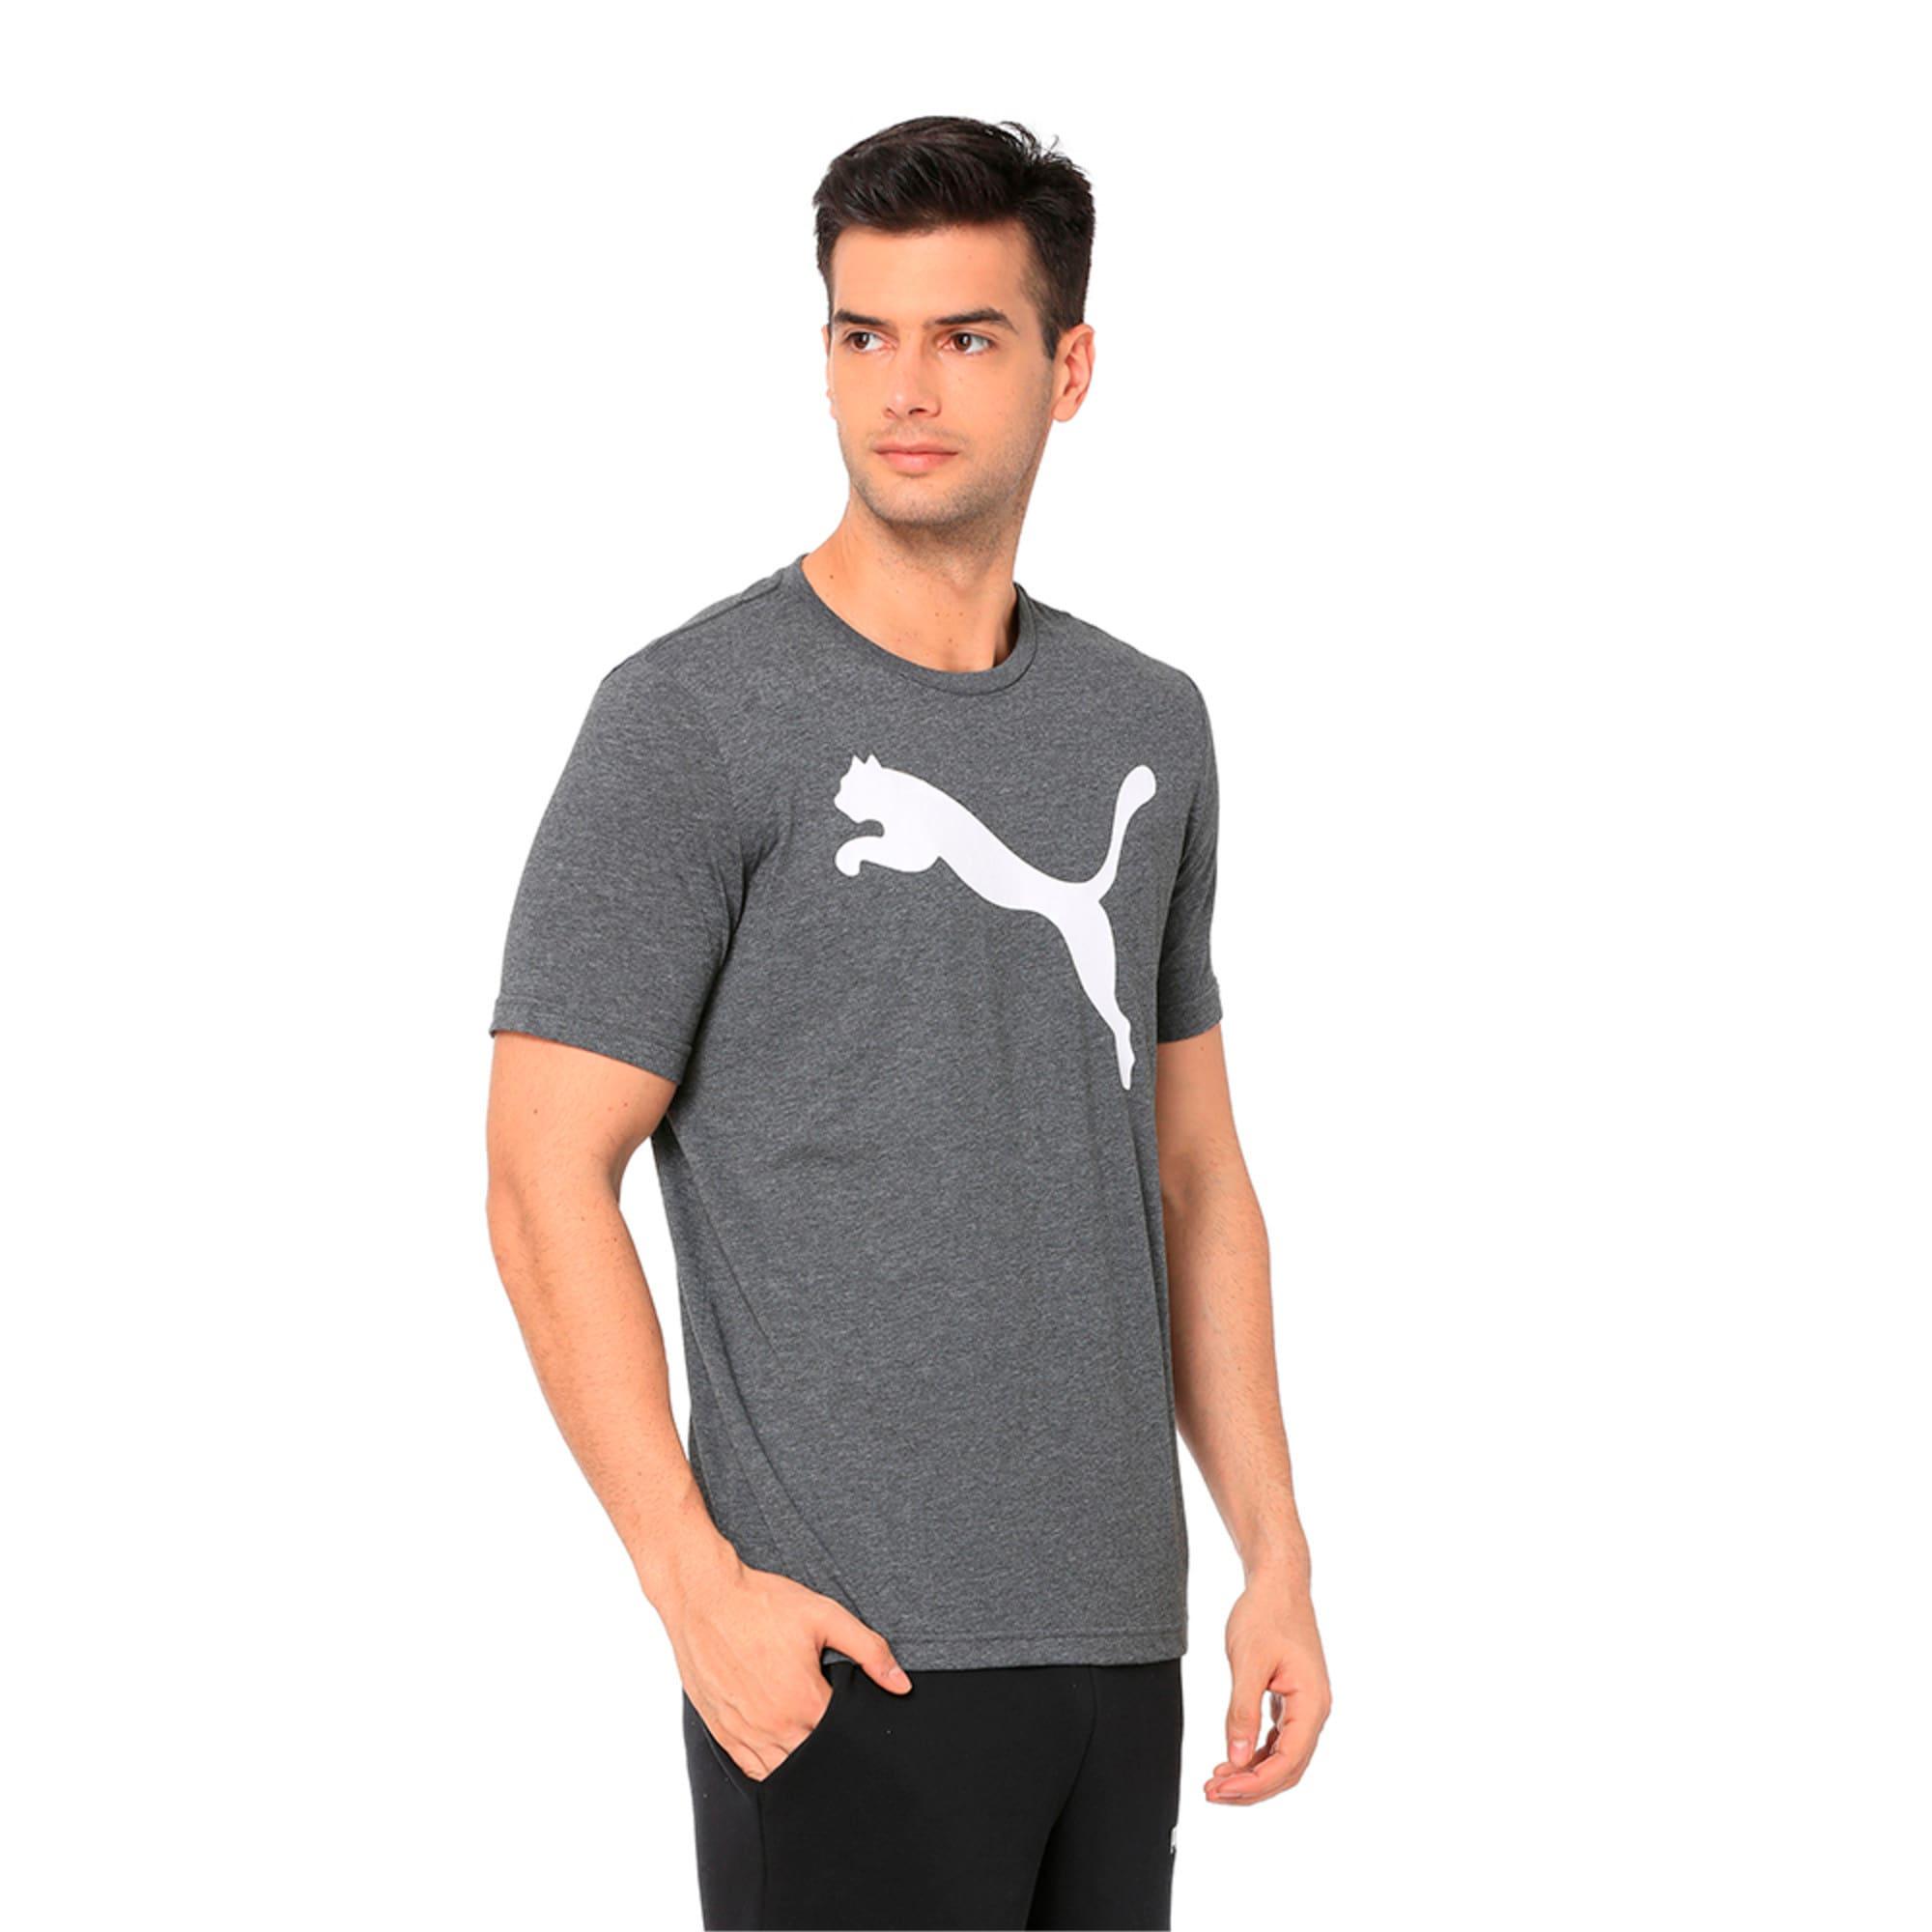 Thumbnail 2 of Men's Big Cat Heather T-Shirt, Puma Black Heather, medium-IND